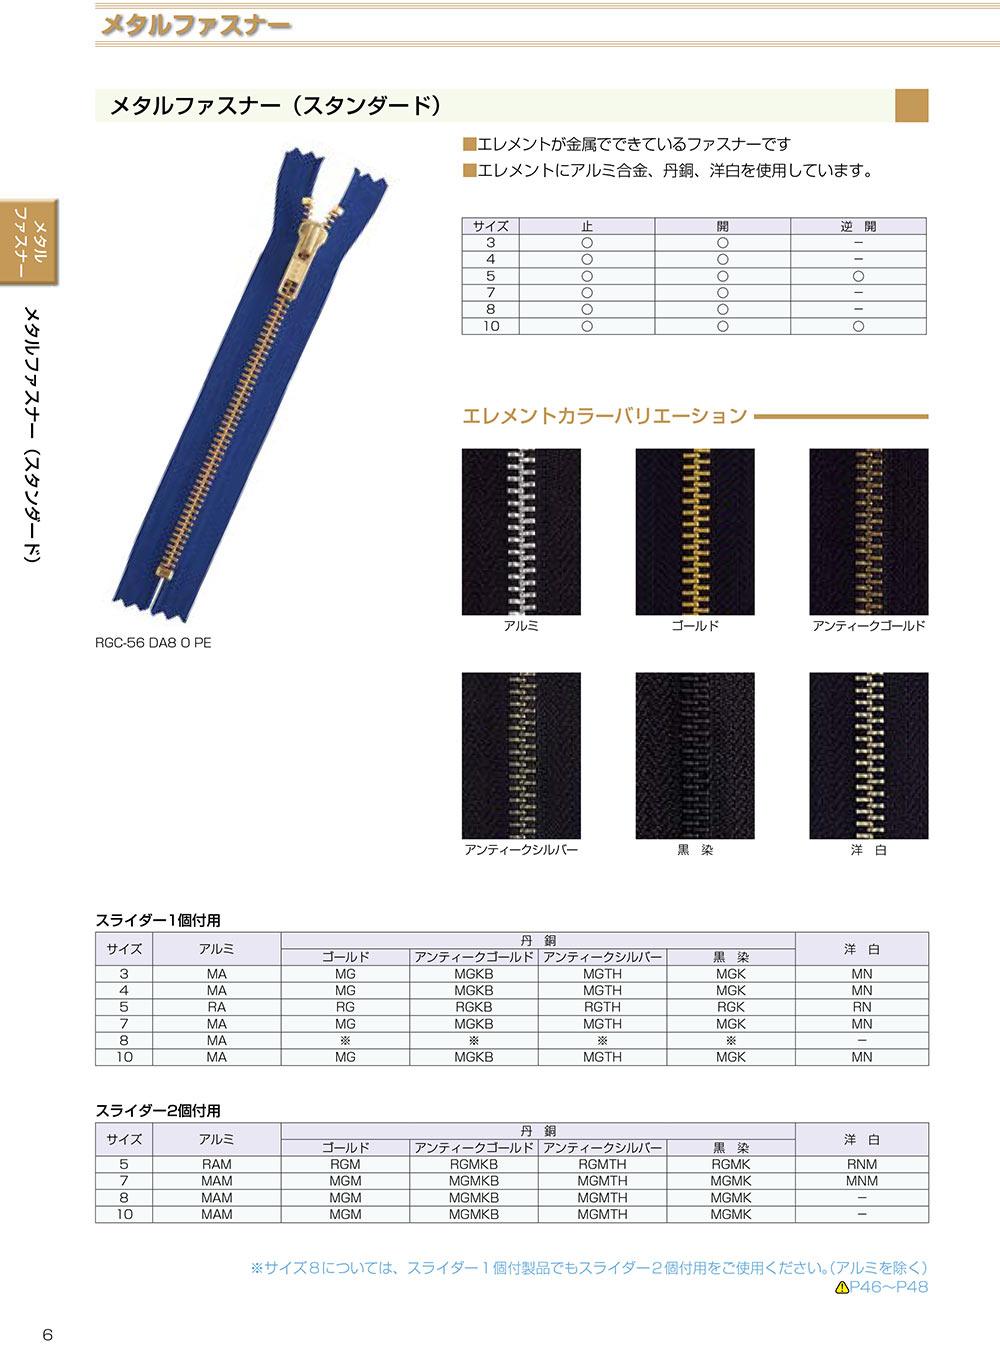 3MGKBOR YKKメタルファスナー 3サイズ アンティークゴールド オープン YKK/オークラ商事 - ApparelX アパレル資材卸通販